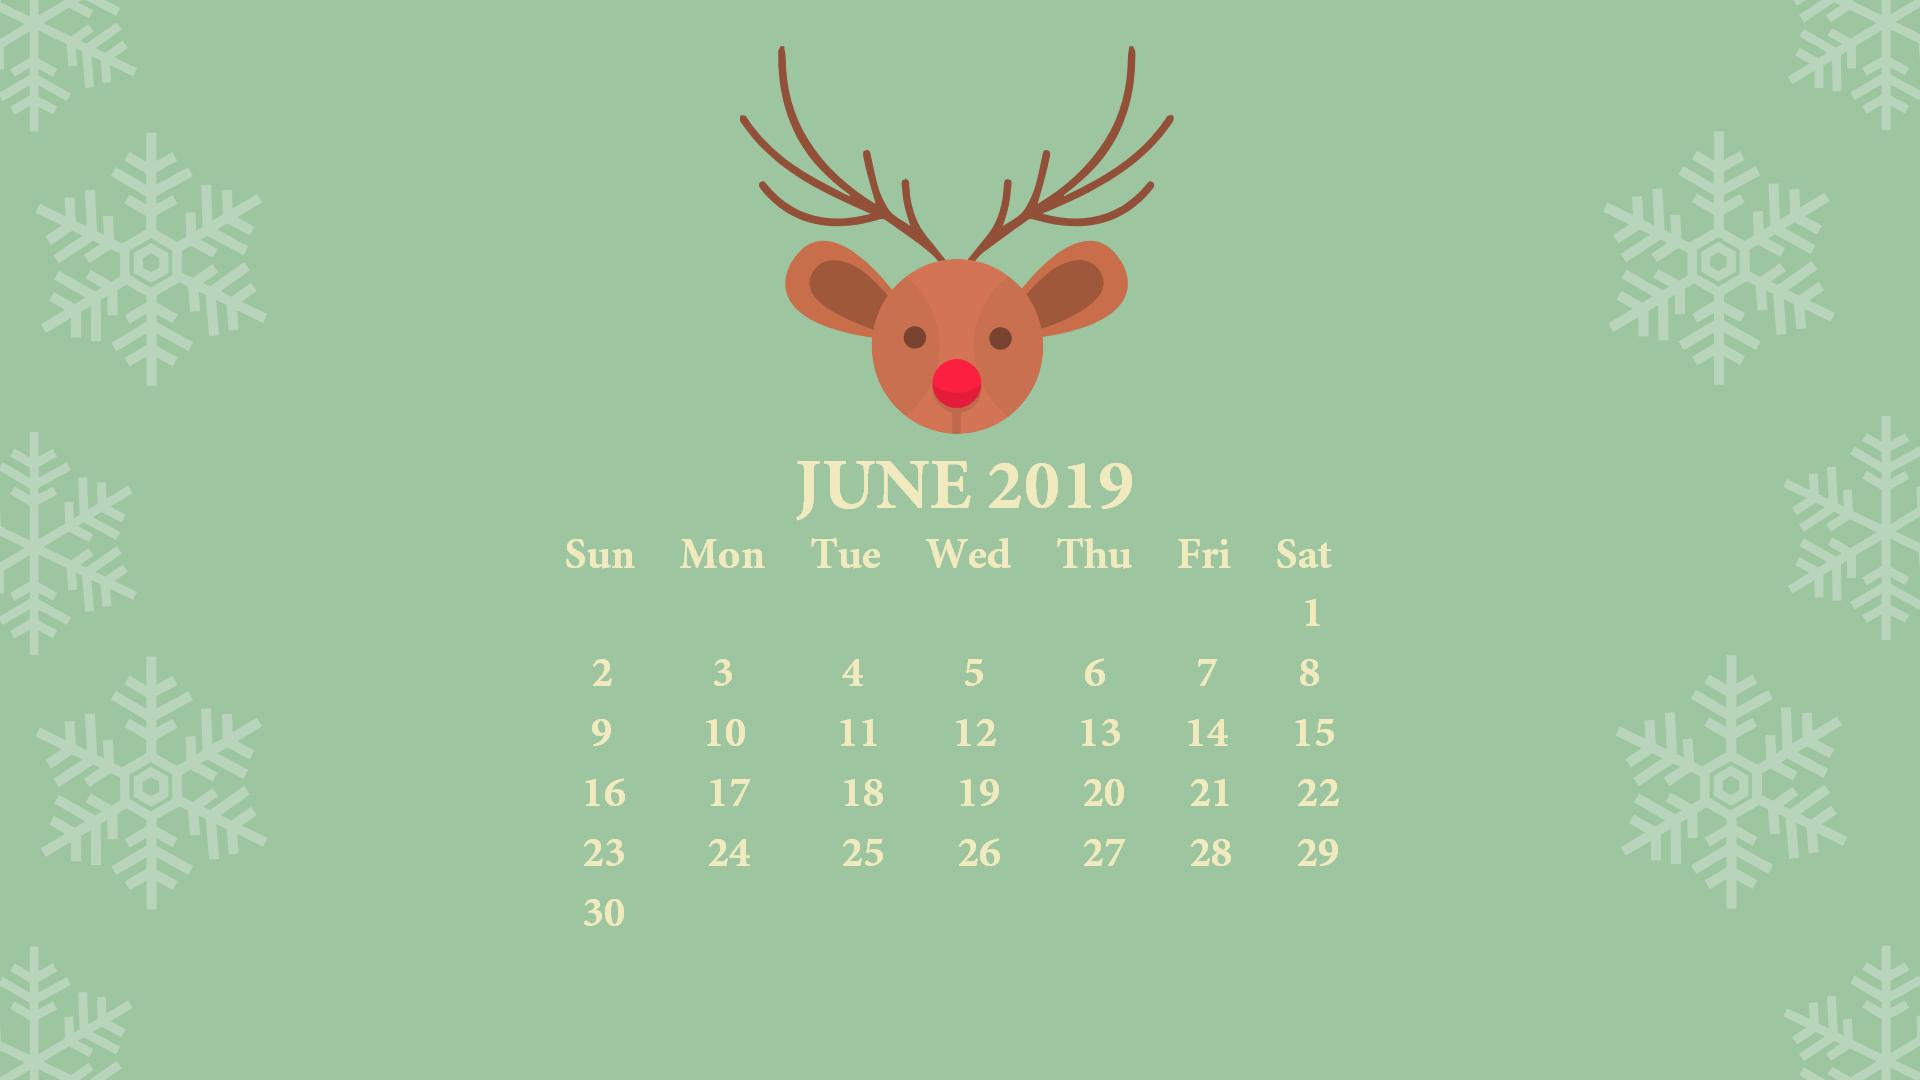 June 2019 Desktop Wallpaper With Calendar